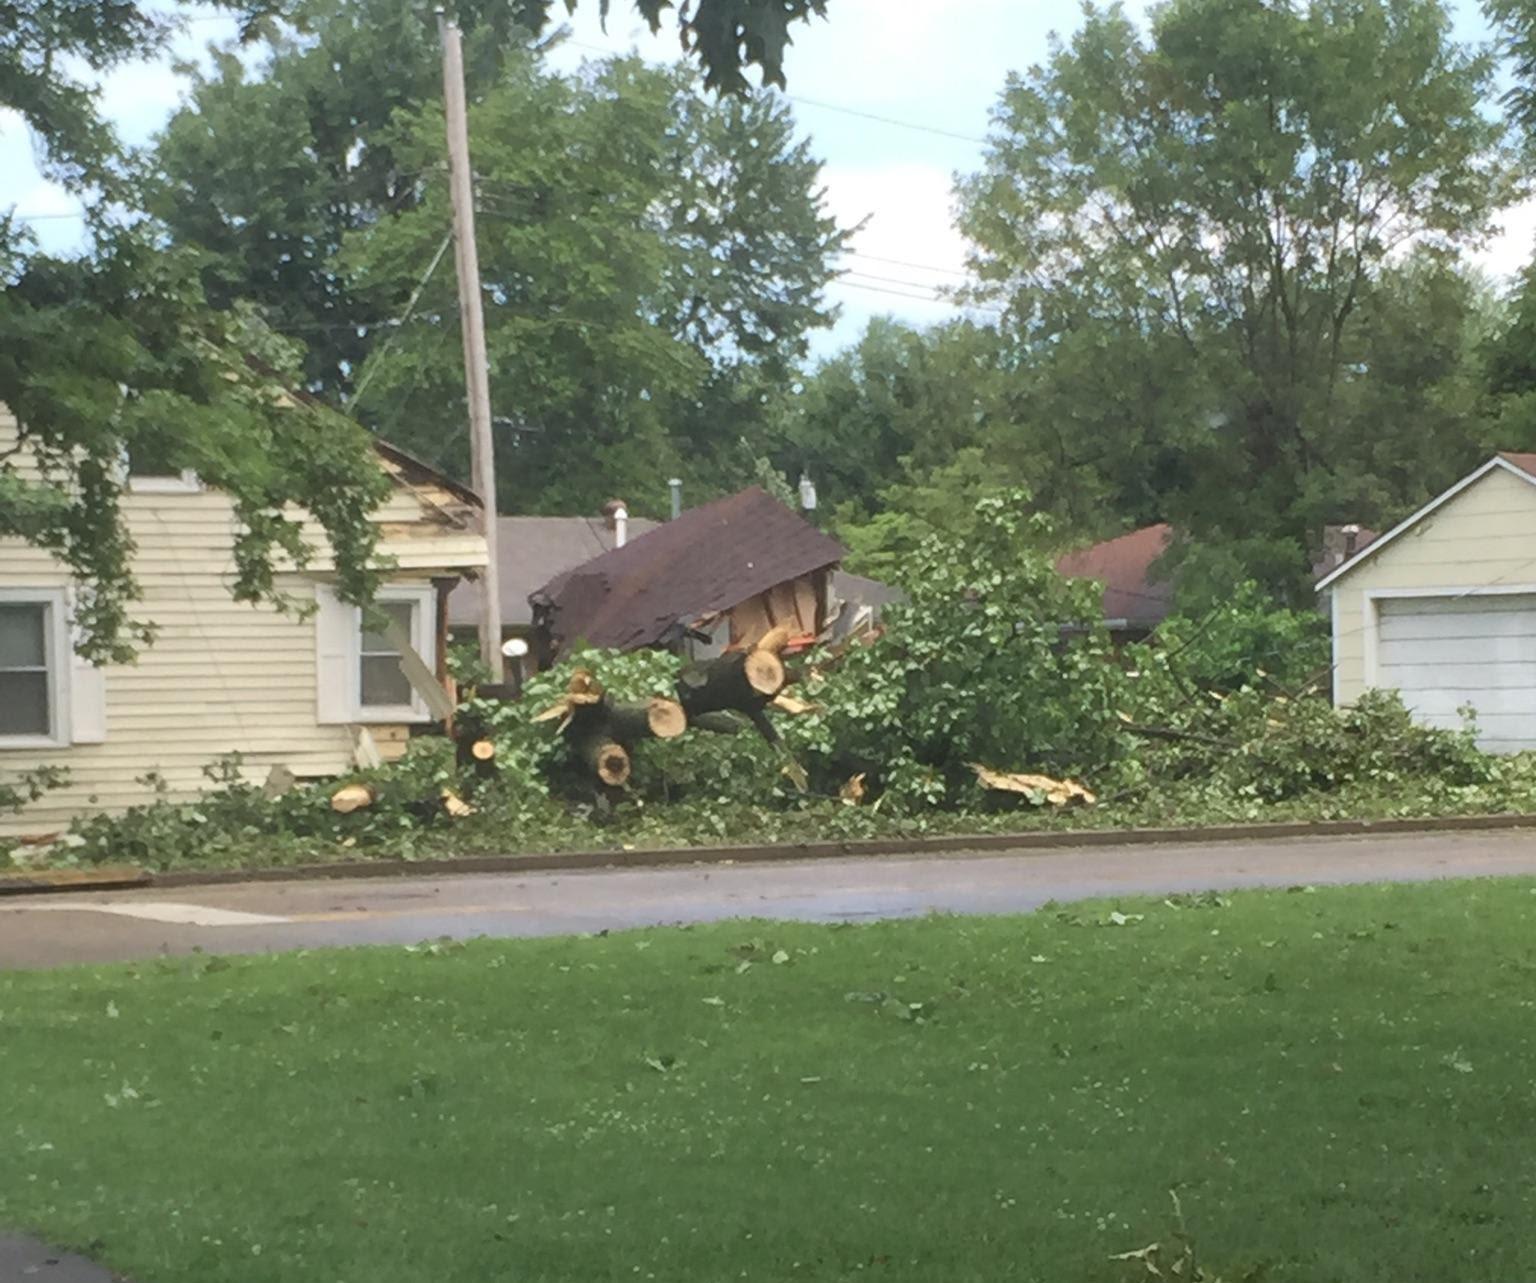 Daviess County Under State of Emergency